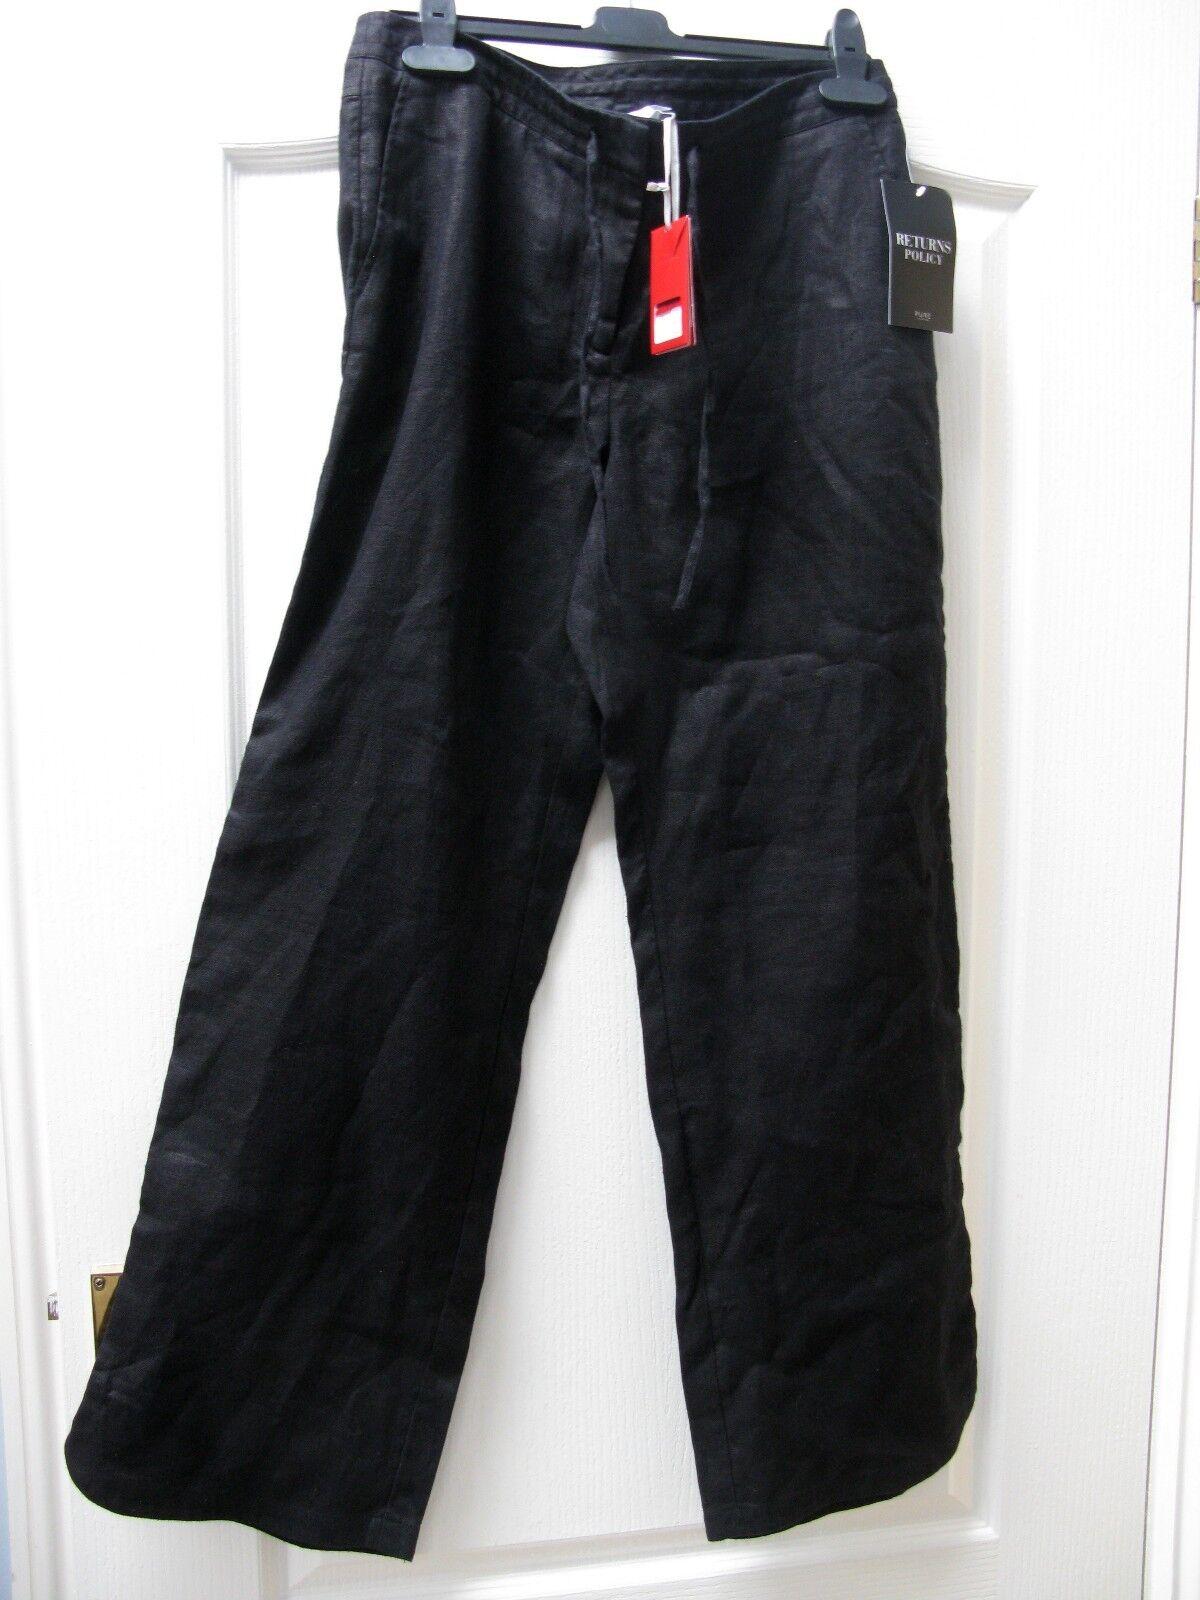 PURE COLLECTION BNWT schwarz Linen Trousers Größe 12